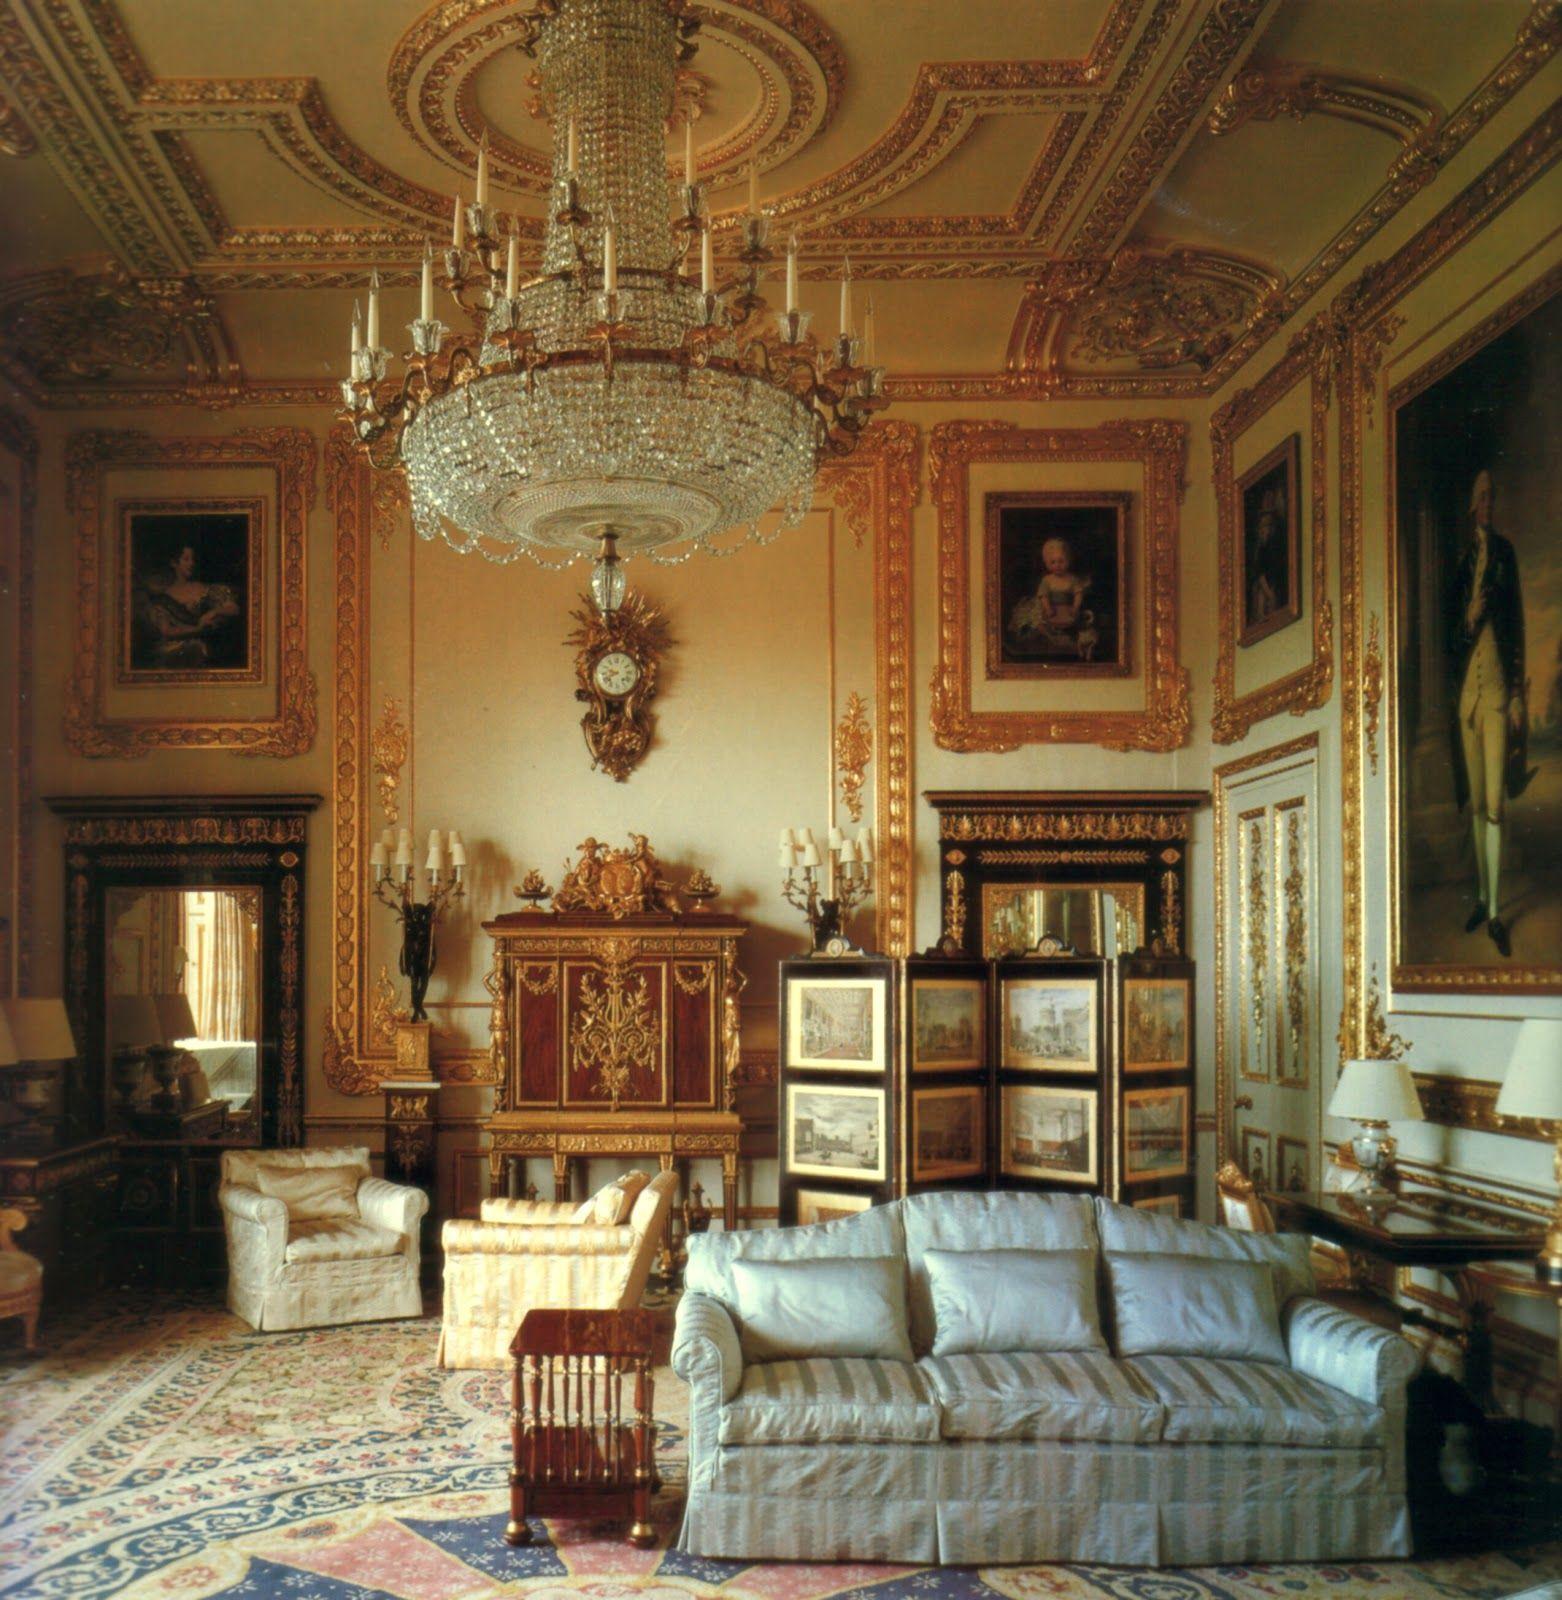 Private Palace Interior Design